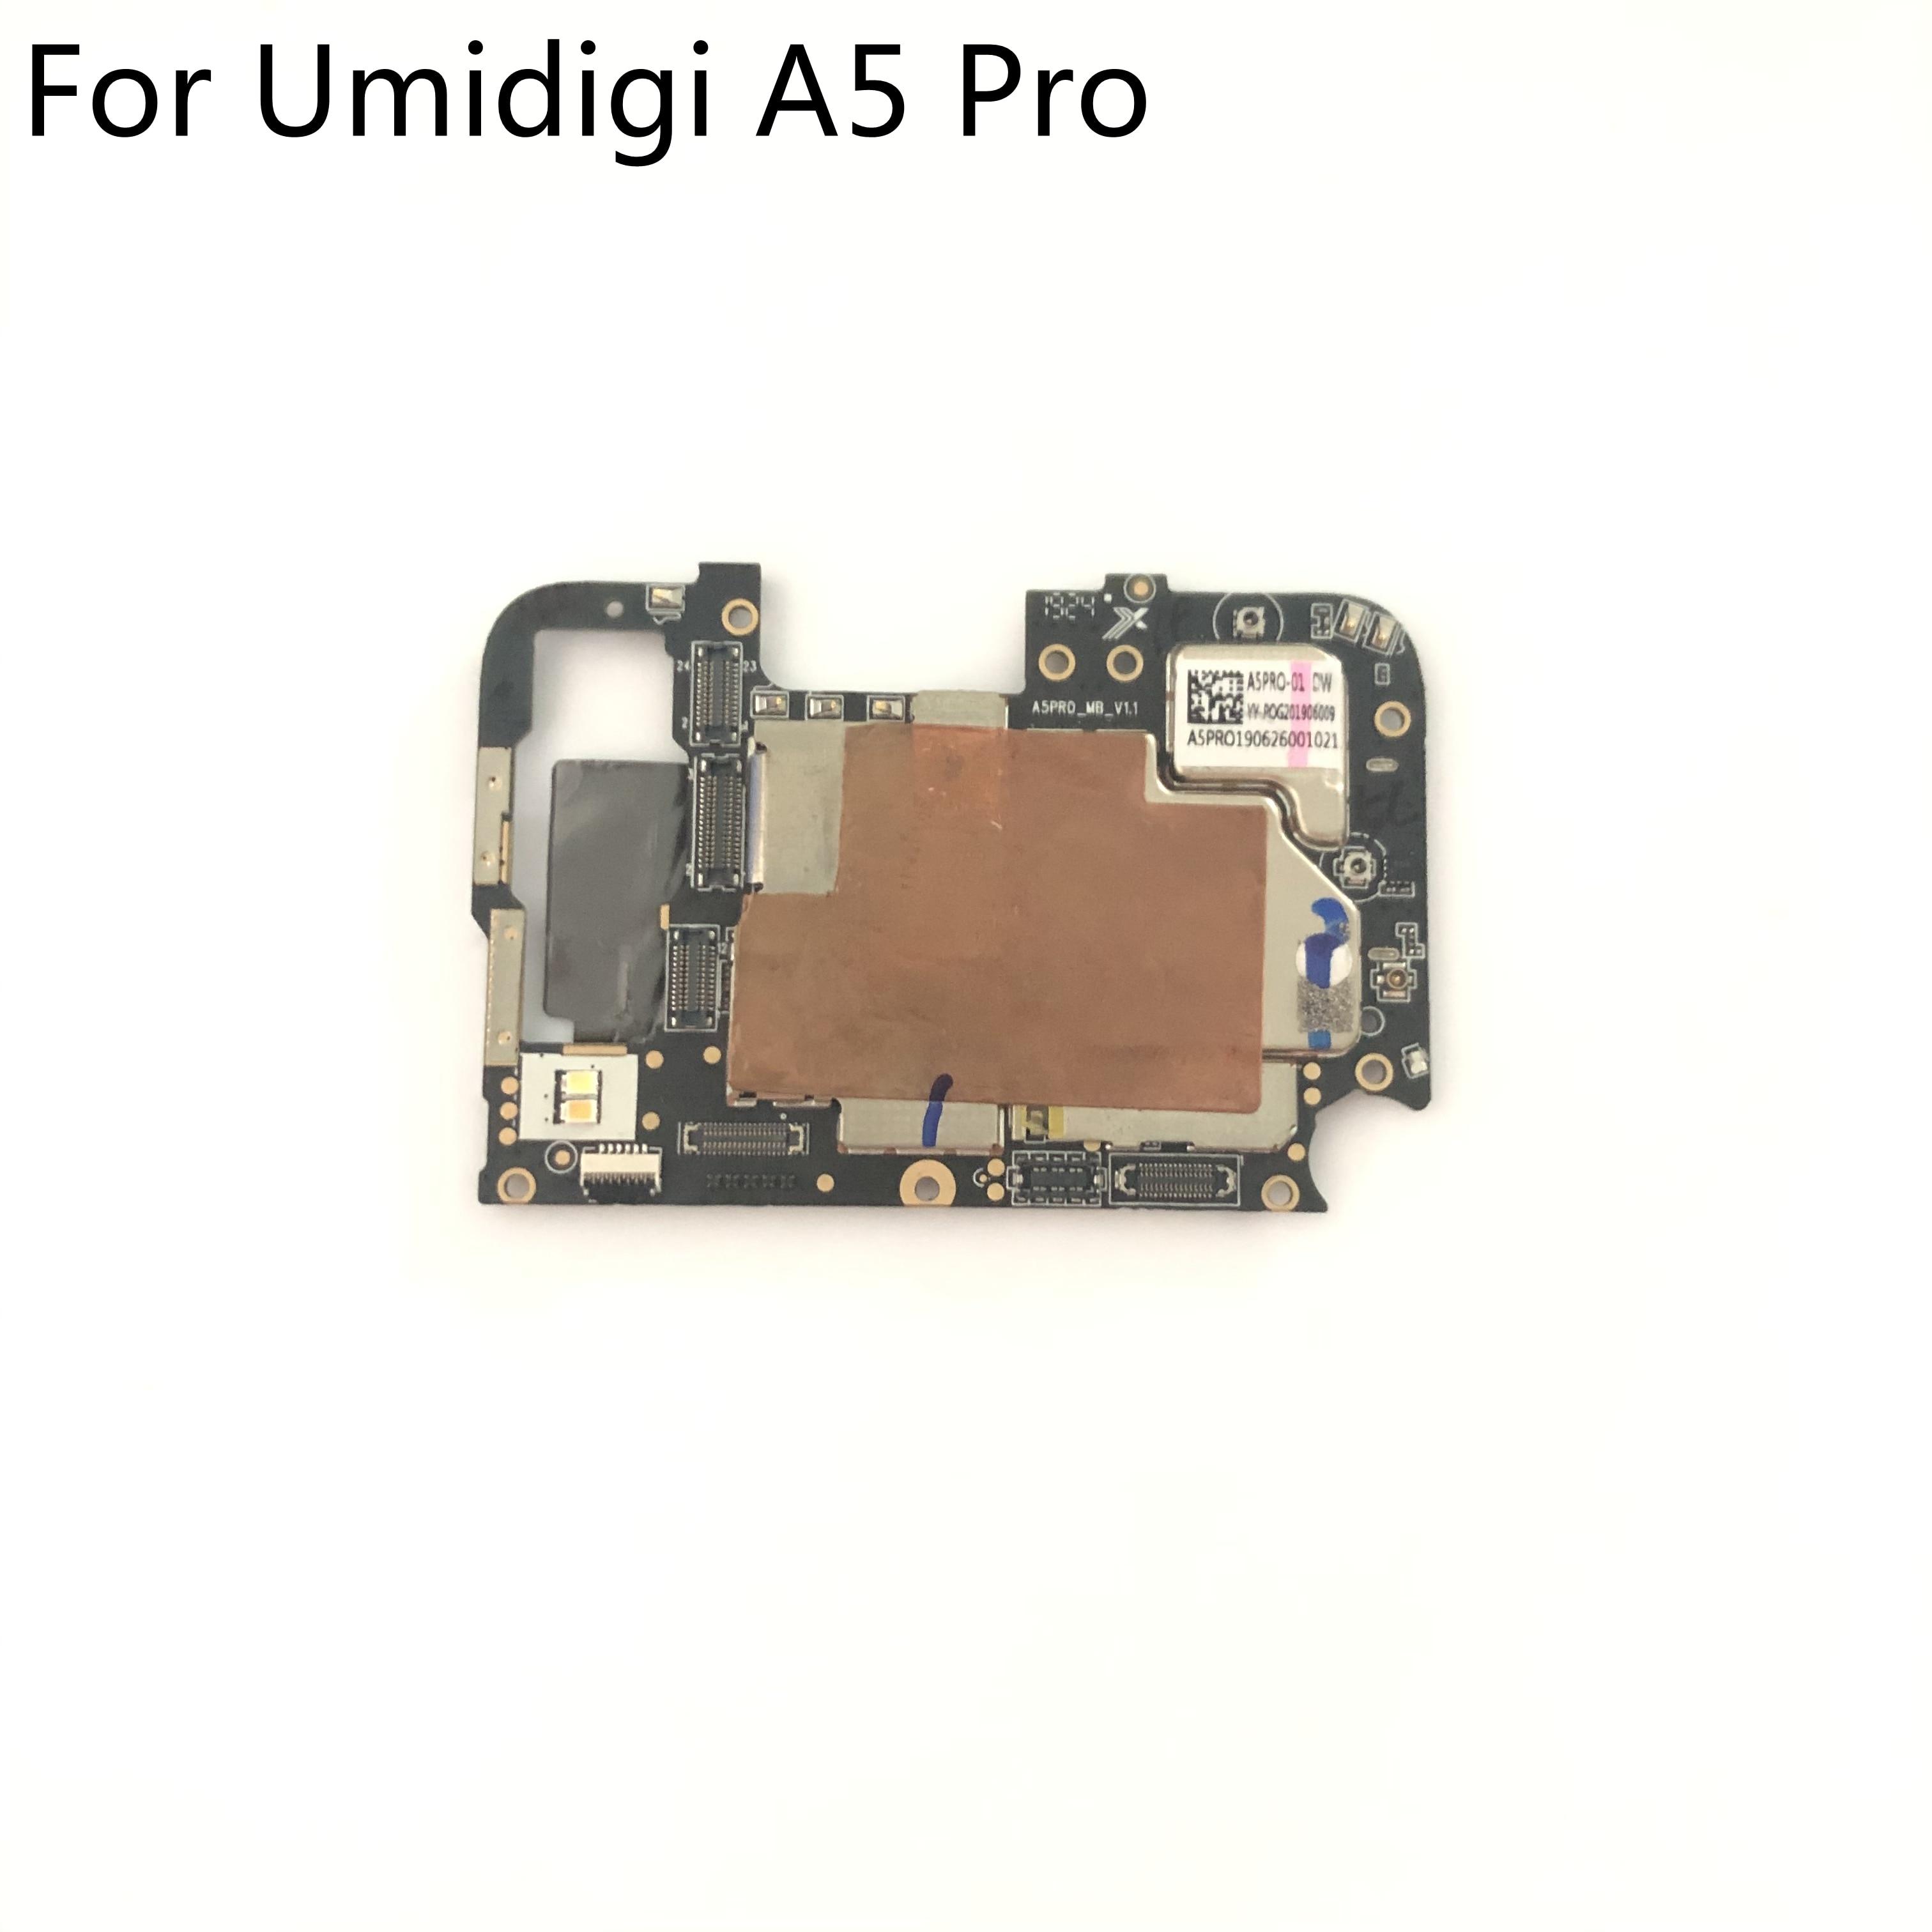 Umidigi A5 Pro Used Mainboard 4G RAM+32G ROM Motherboard For Umidigi A5 Pro Smartphone Free Shipping